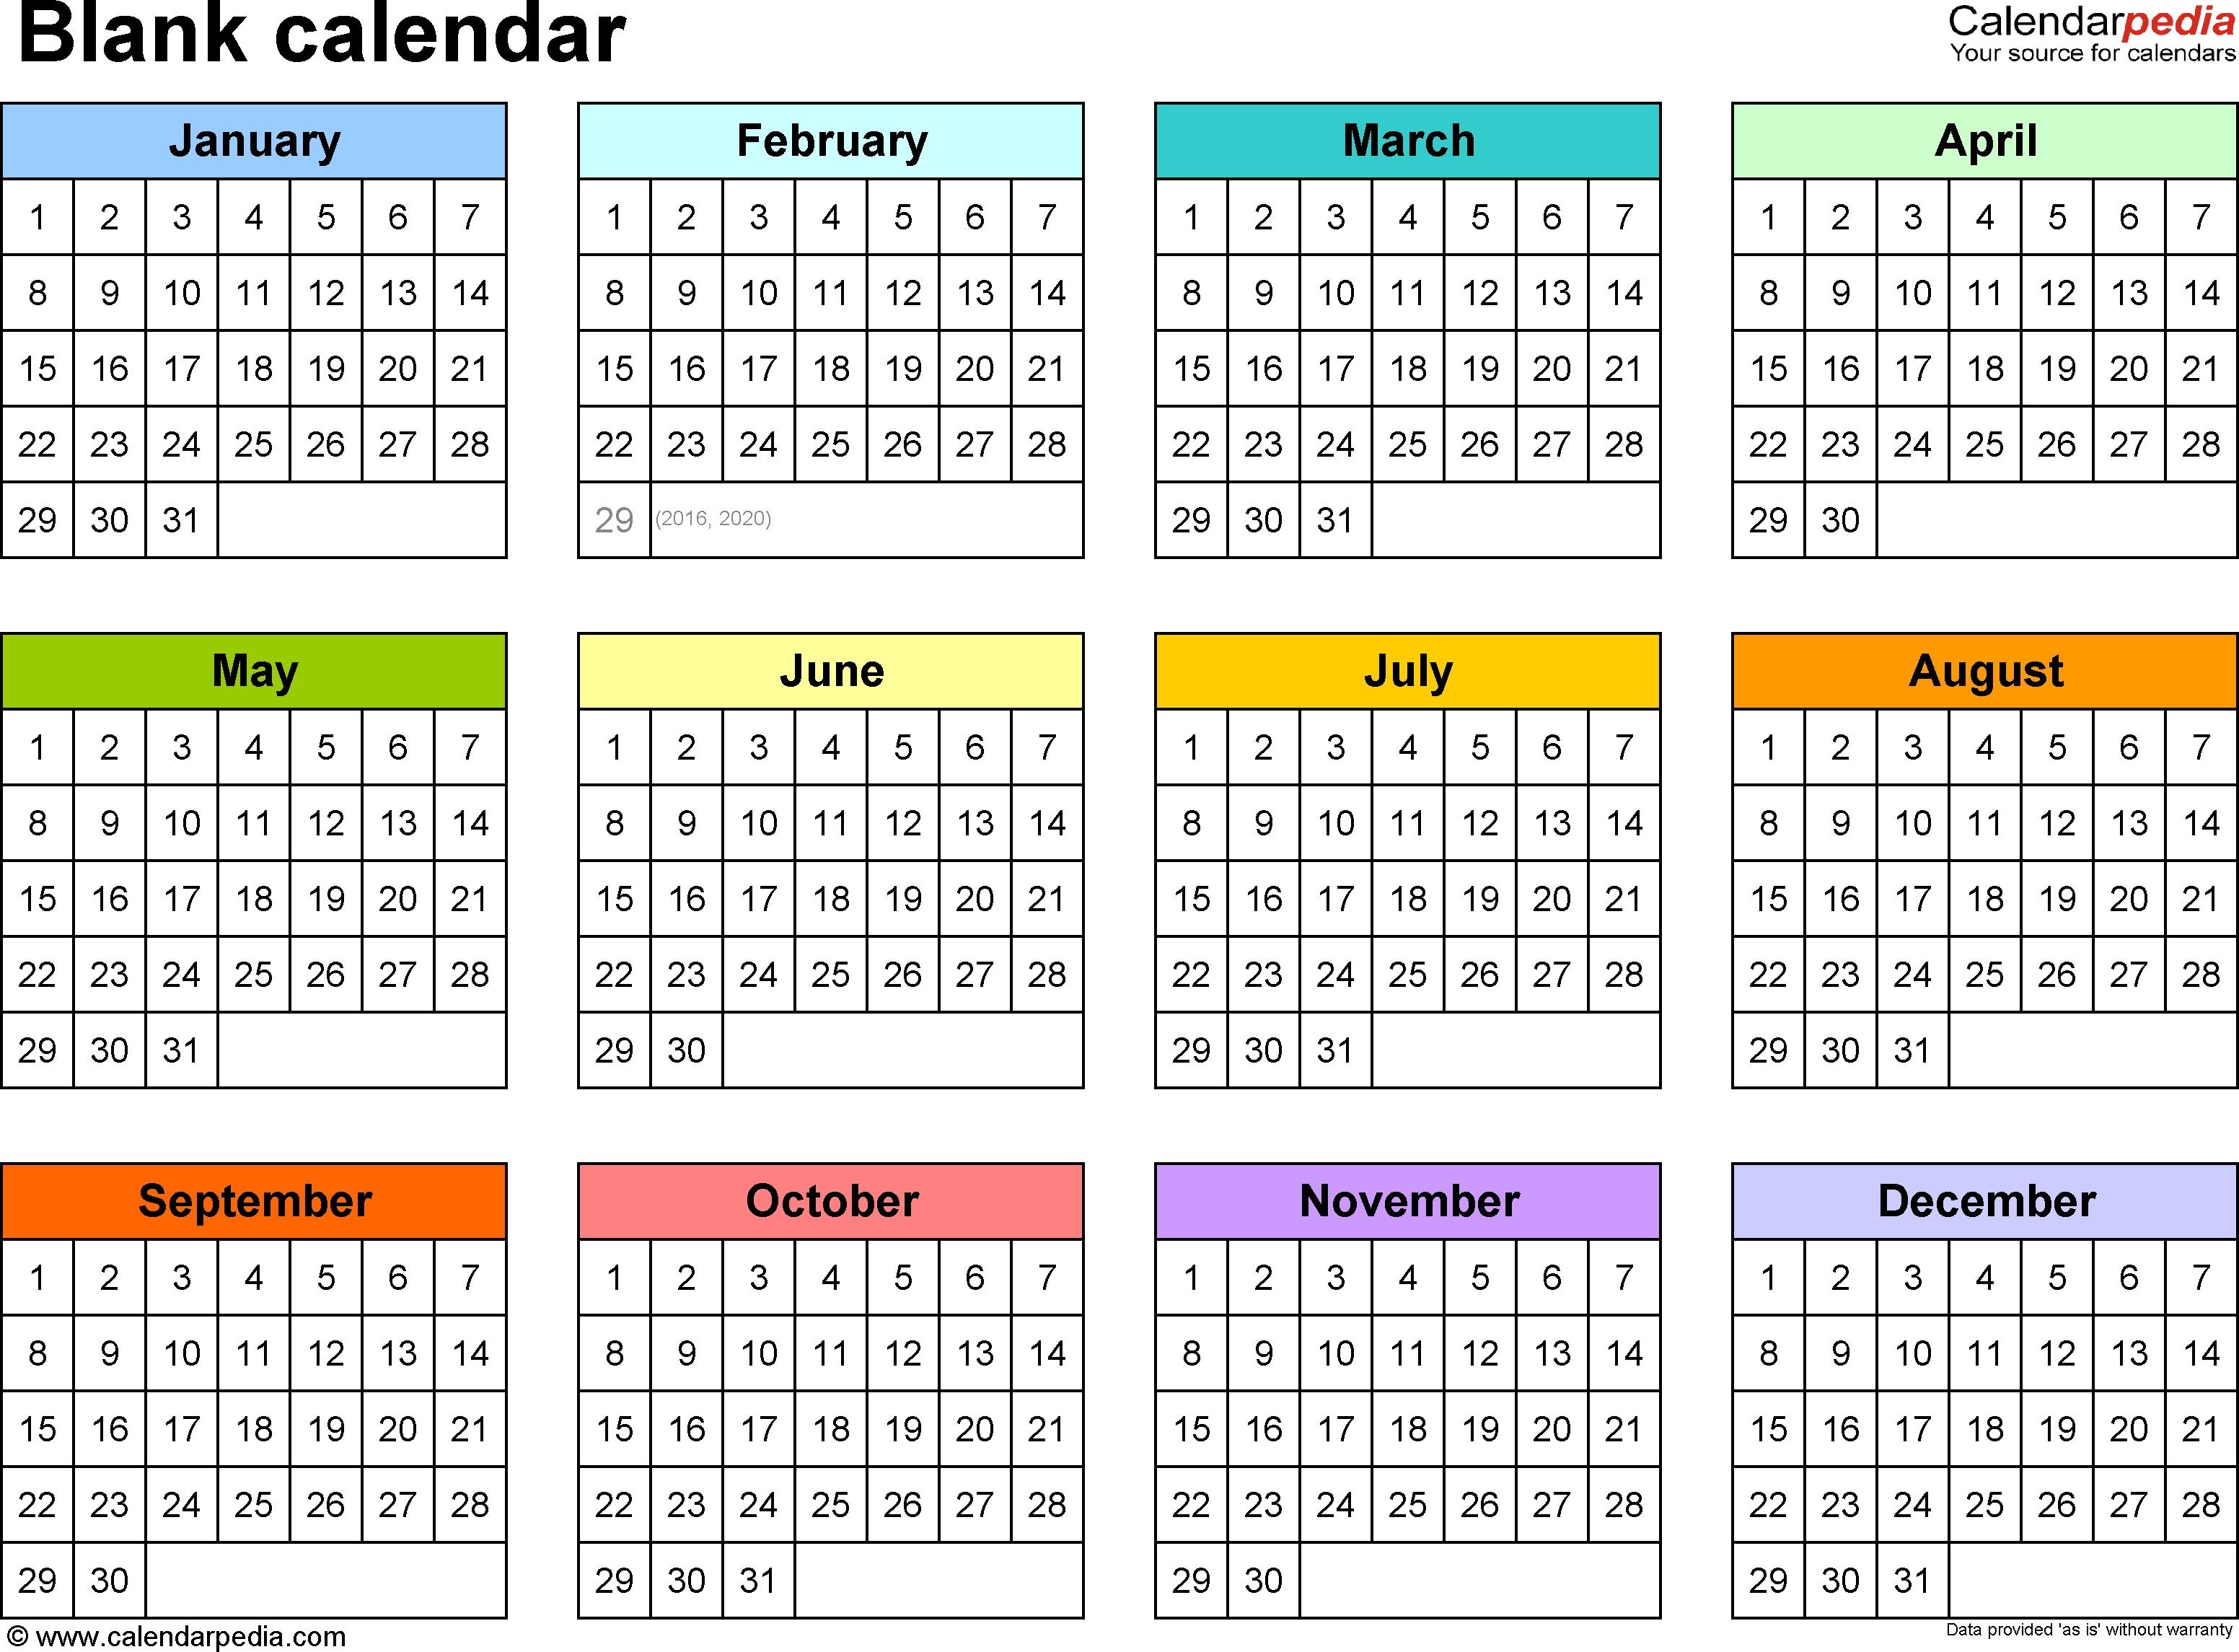 Blank Calendar - 9 Free Printable Microsoft Word Templates  12 Month Calendar Word Template